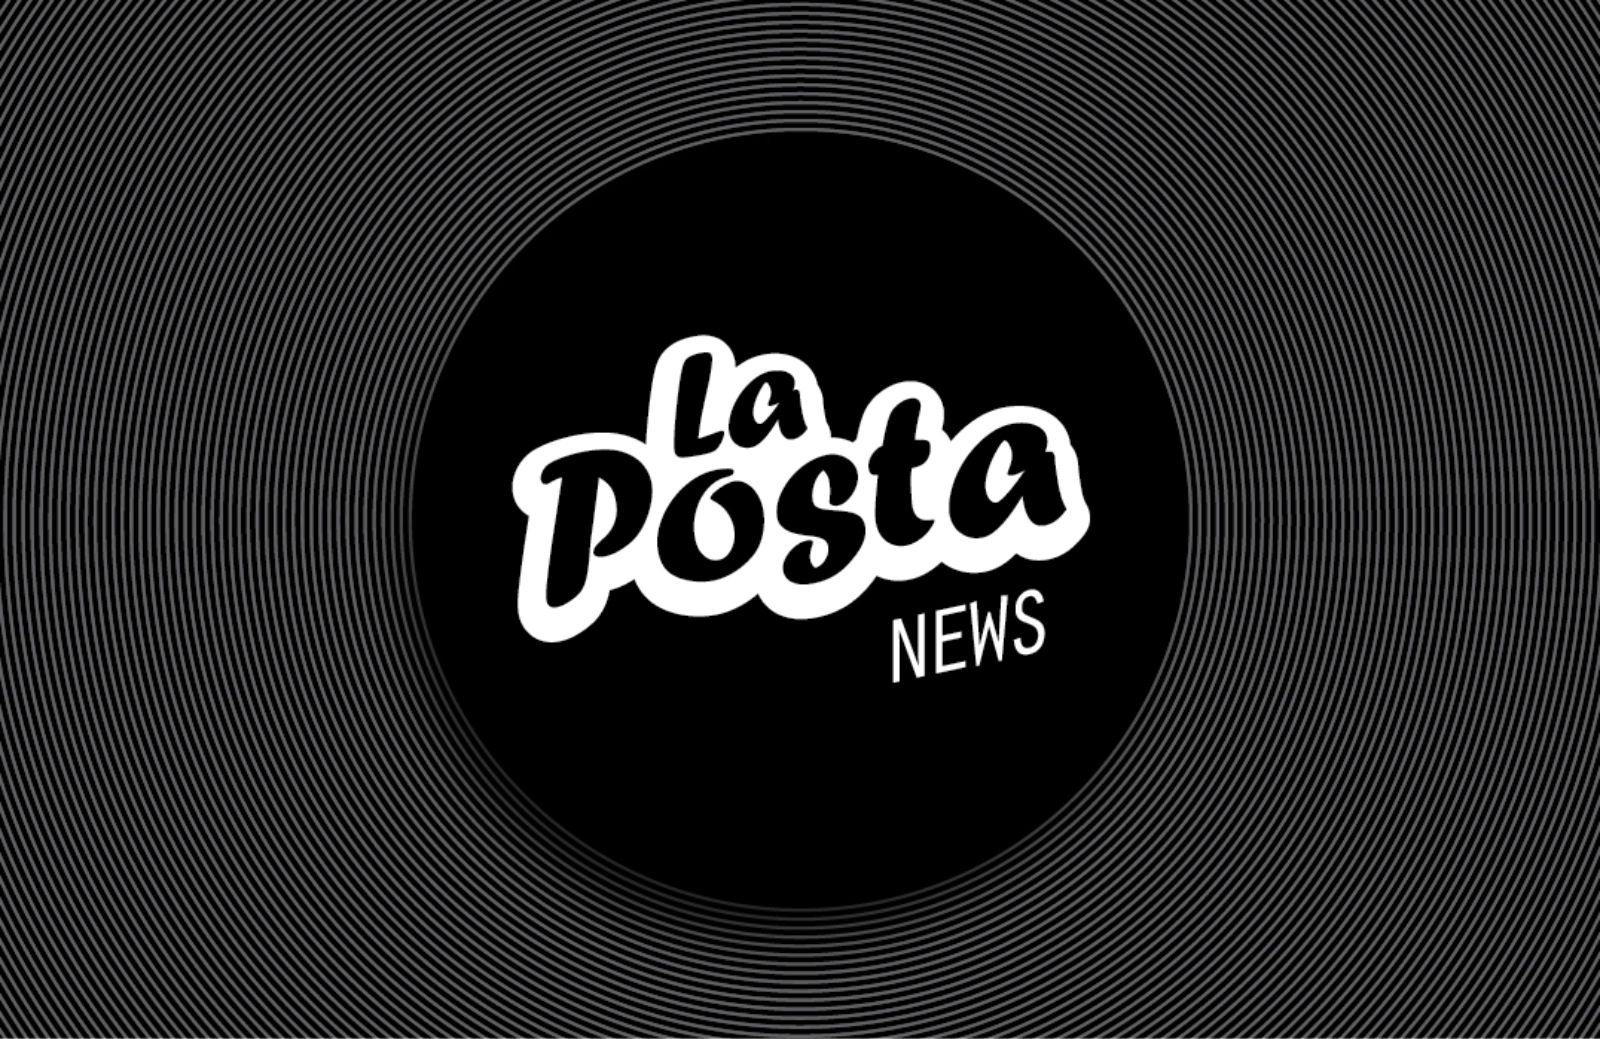 leo montes, leomontes, LA POSTA NEWS